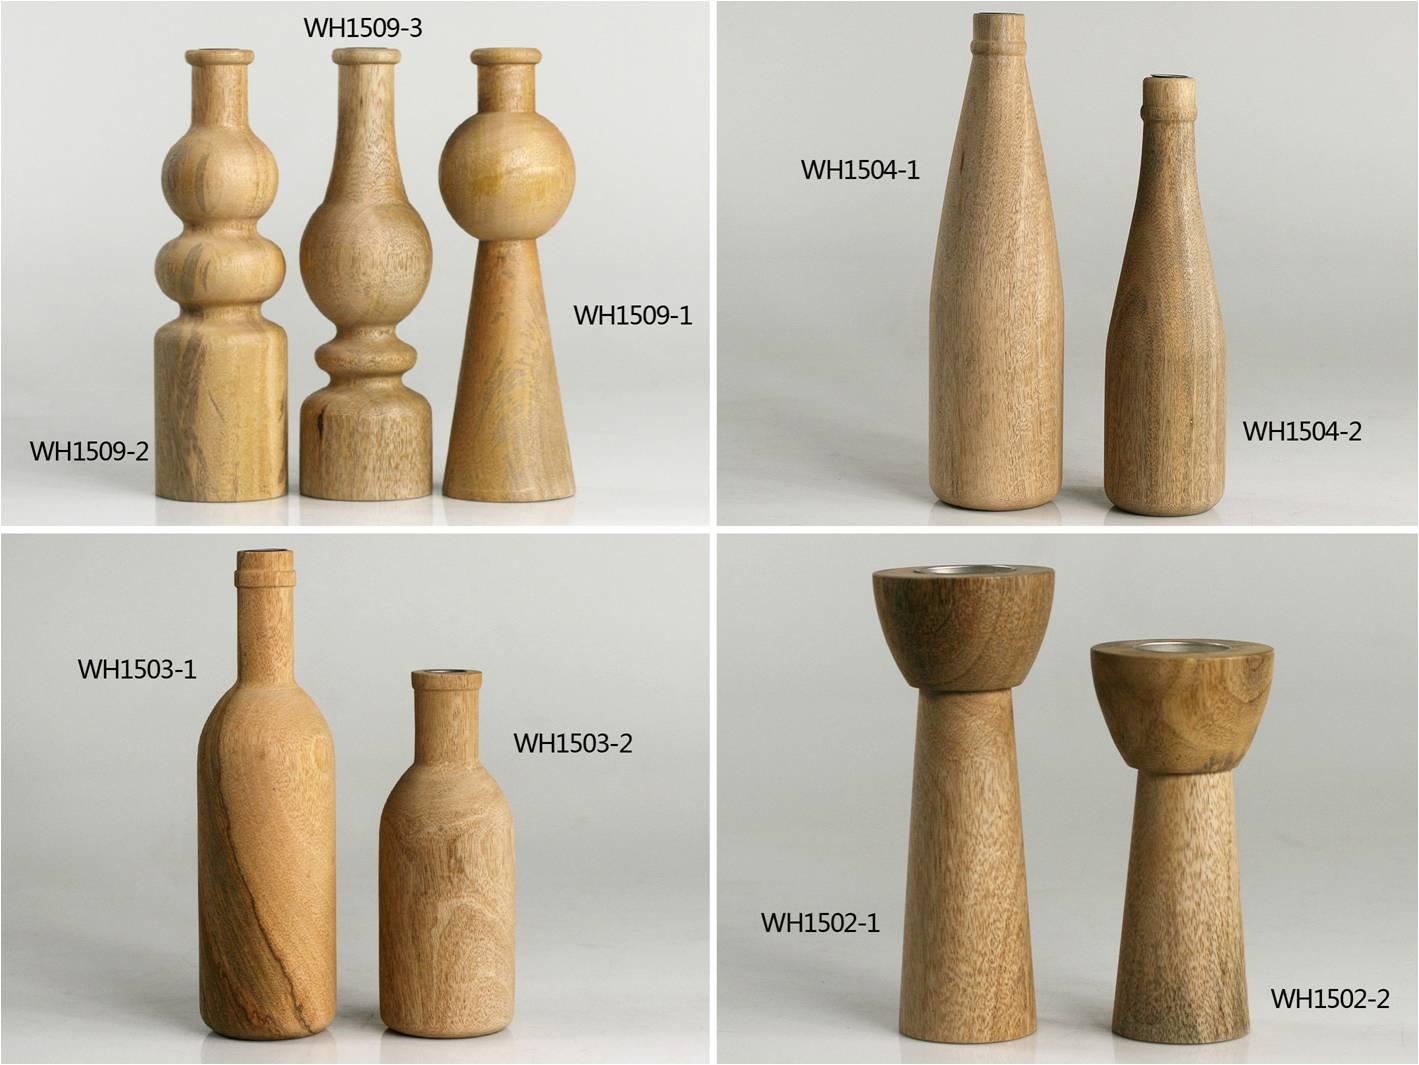 木艺产品 Wooden Products-16